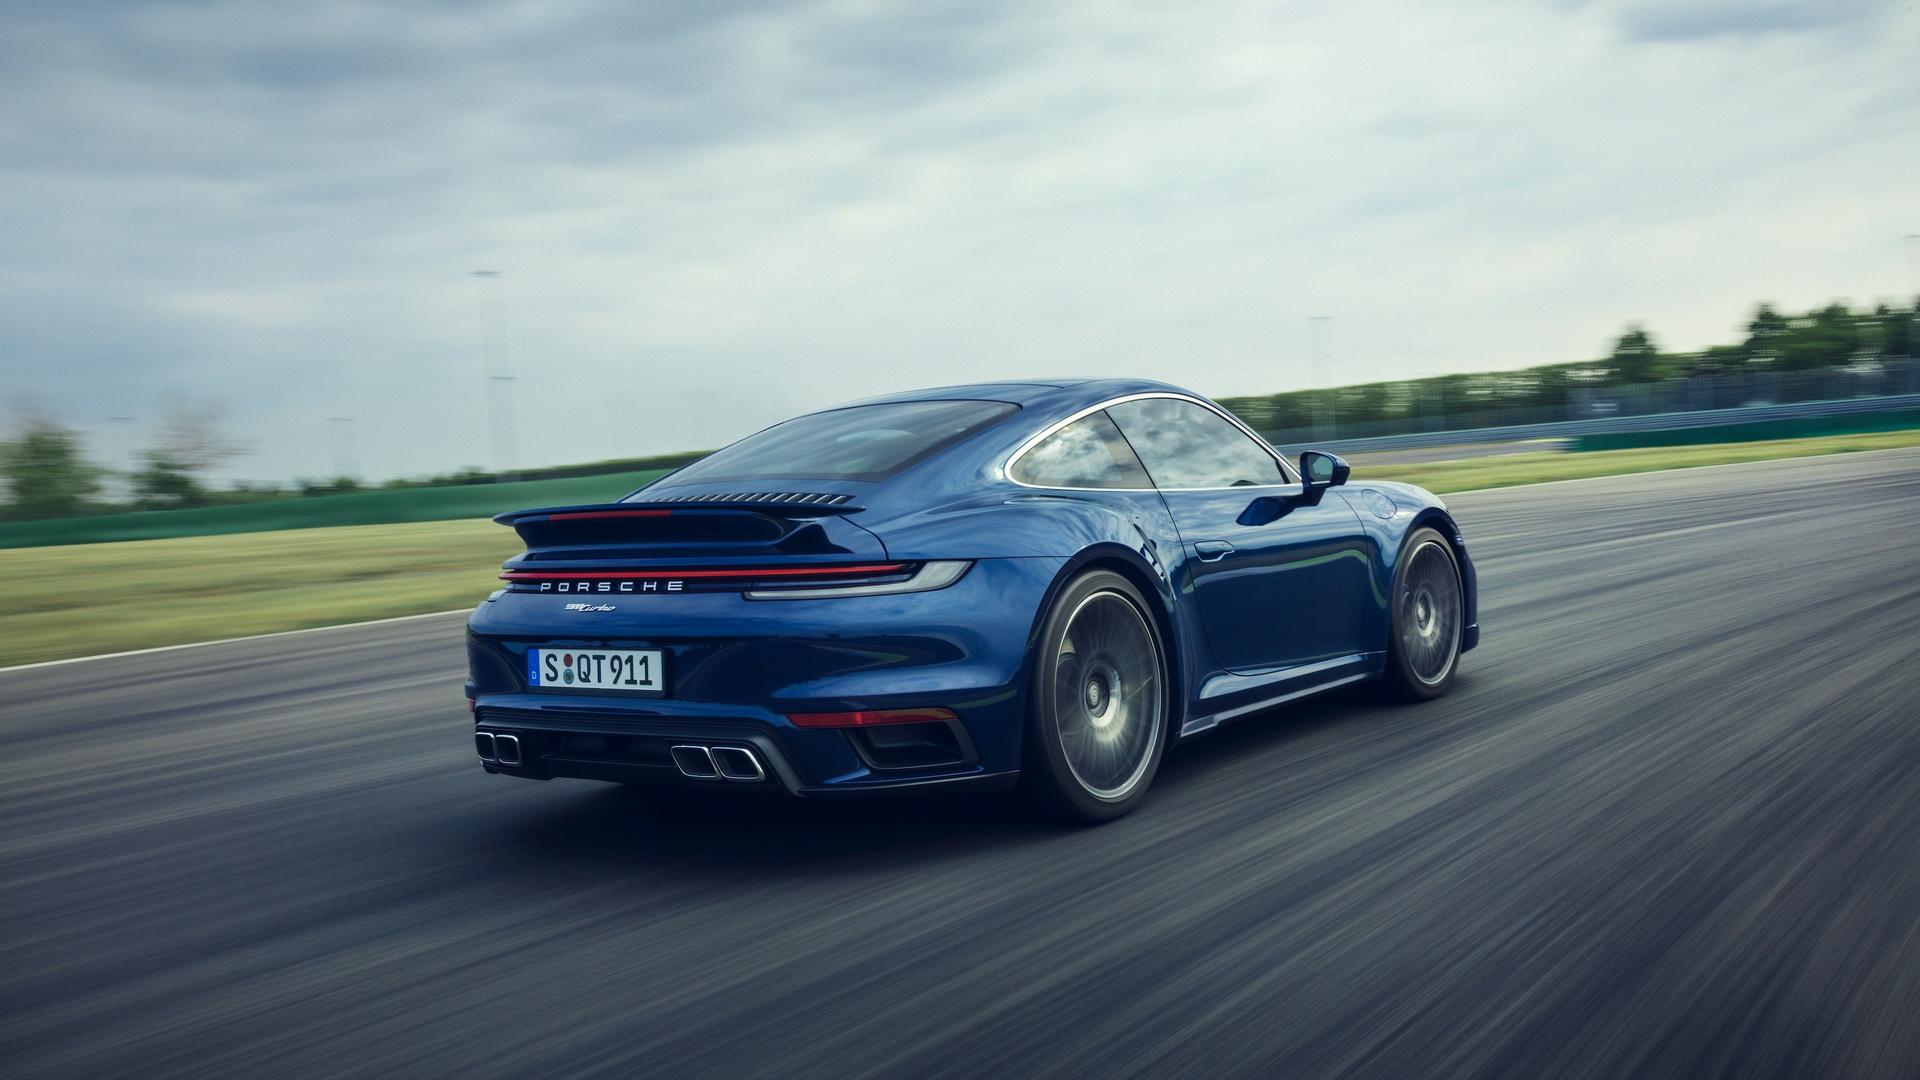 2020-porsche-911-turbo-1